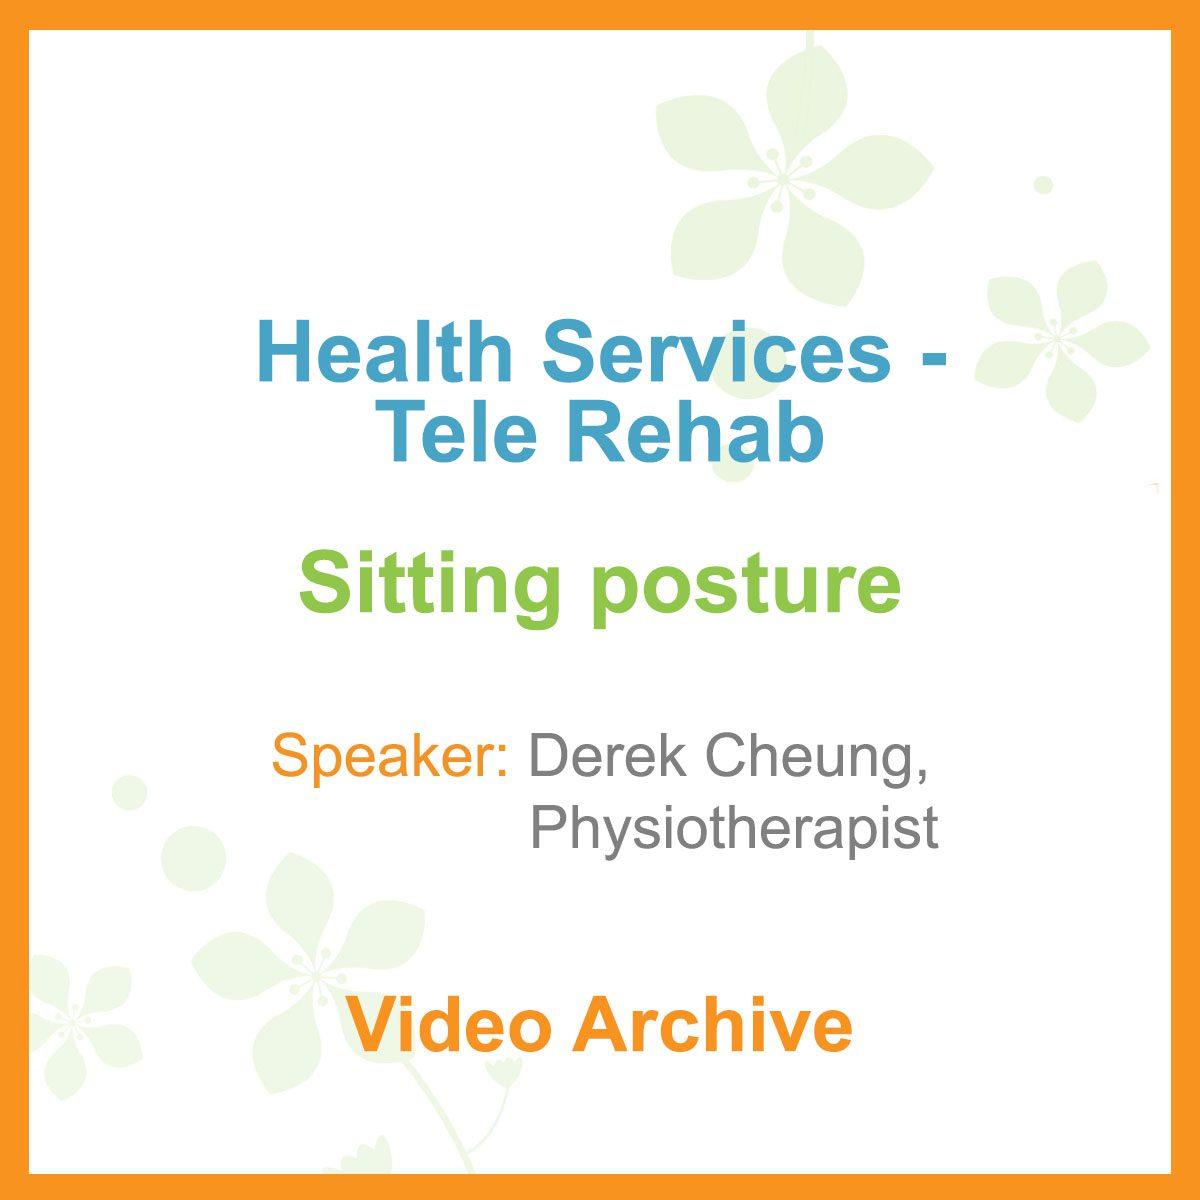 Health Services - Health Talk Video - Sitting Posture